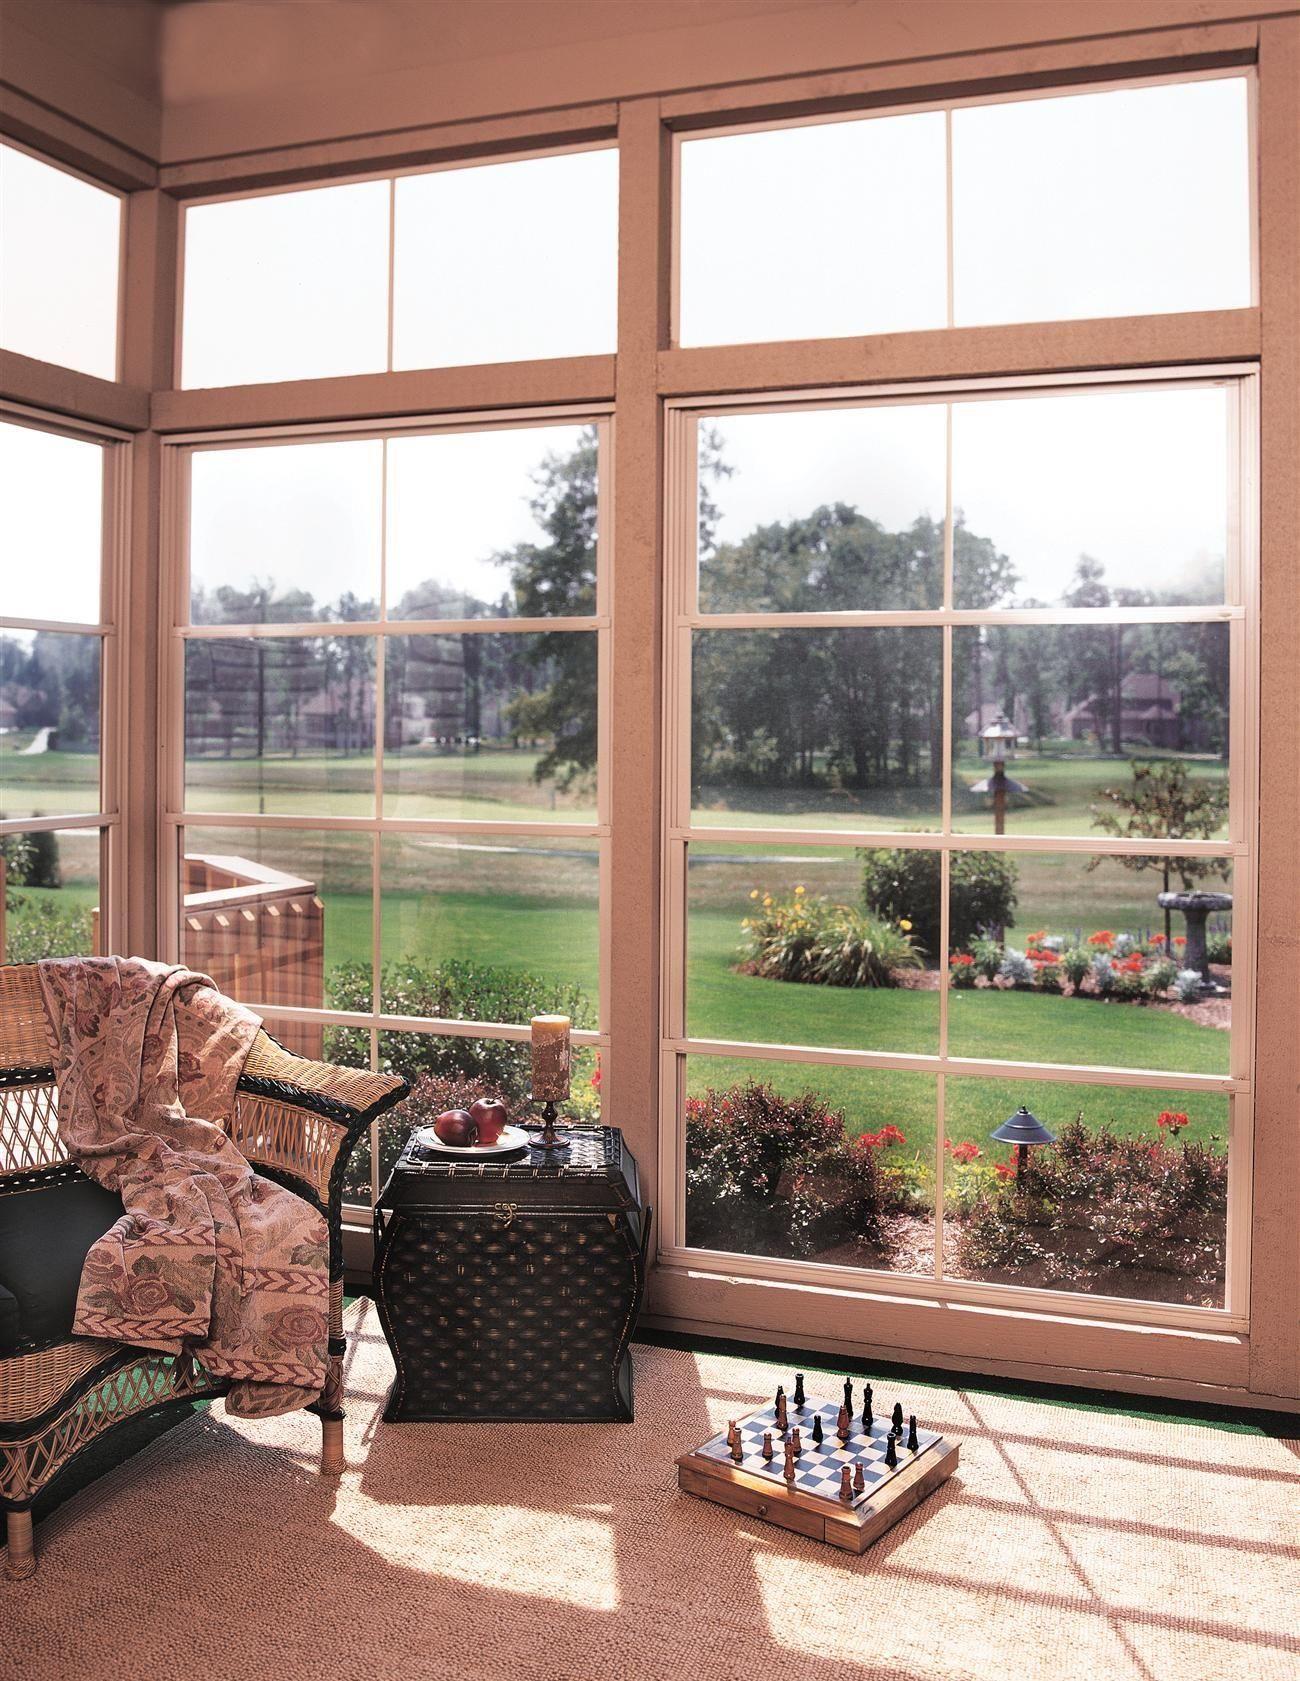 3 season porch window ideas  pgt eze breeze  great ideas  pinterest  photo galleries and galleries